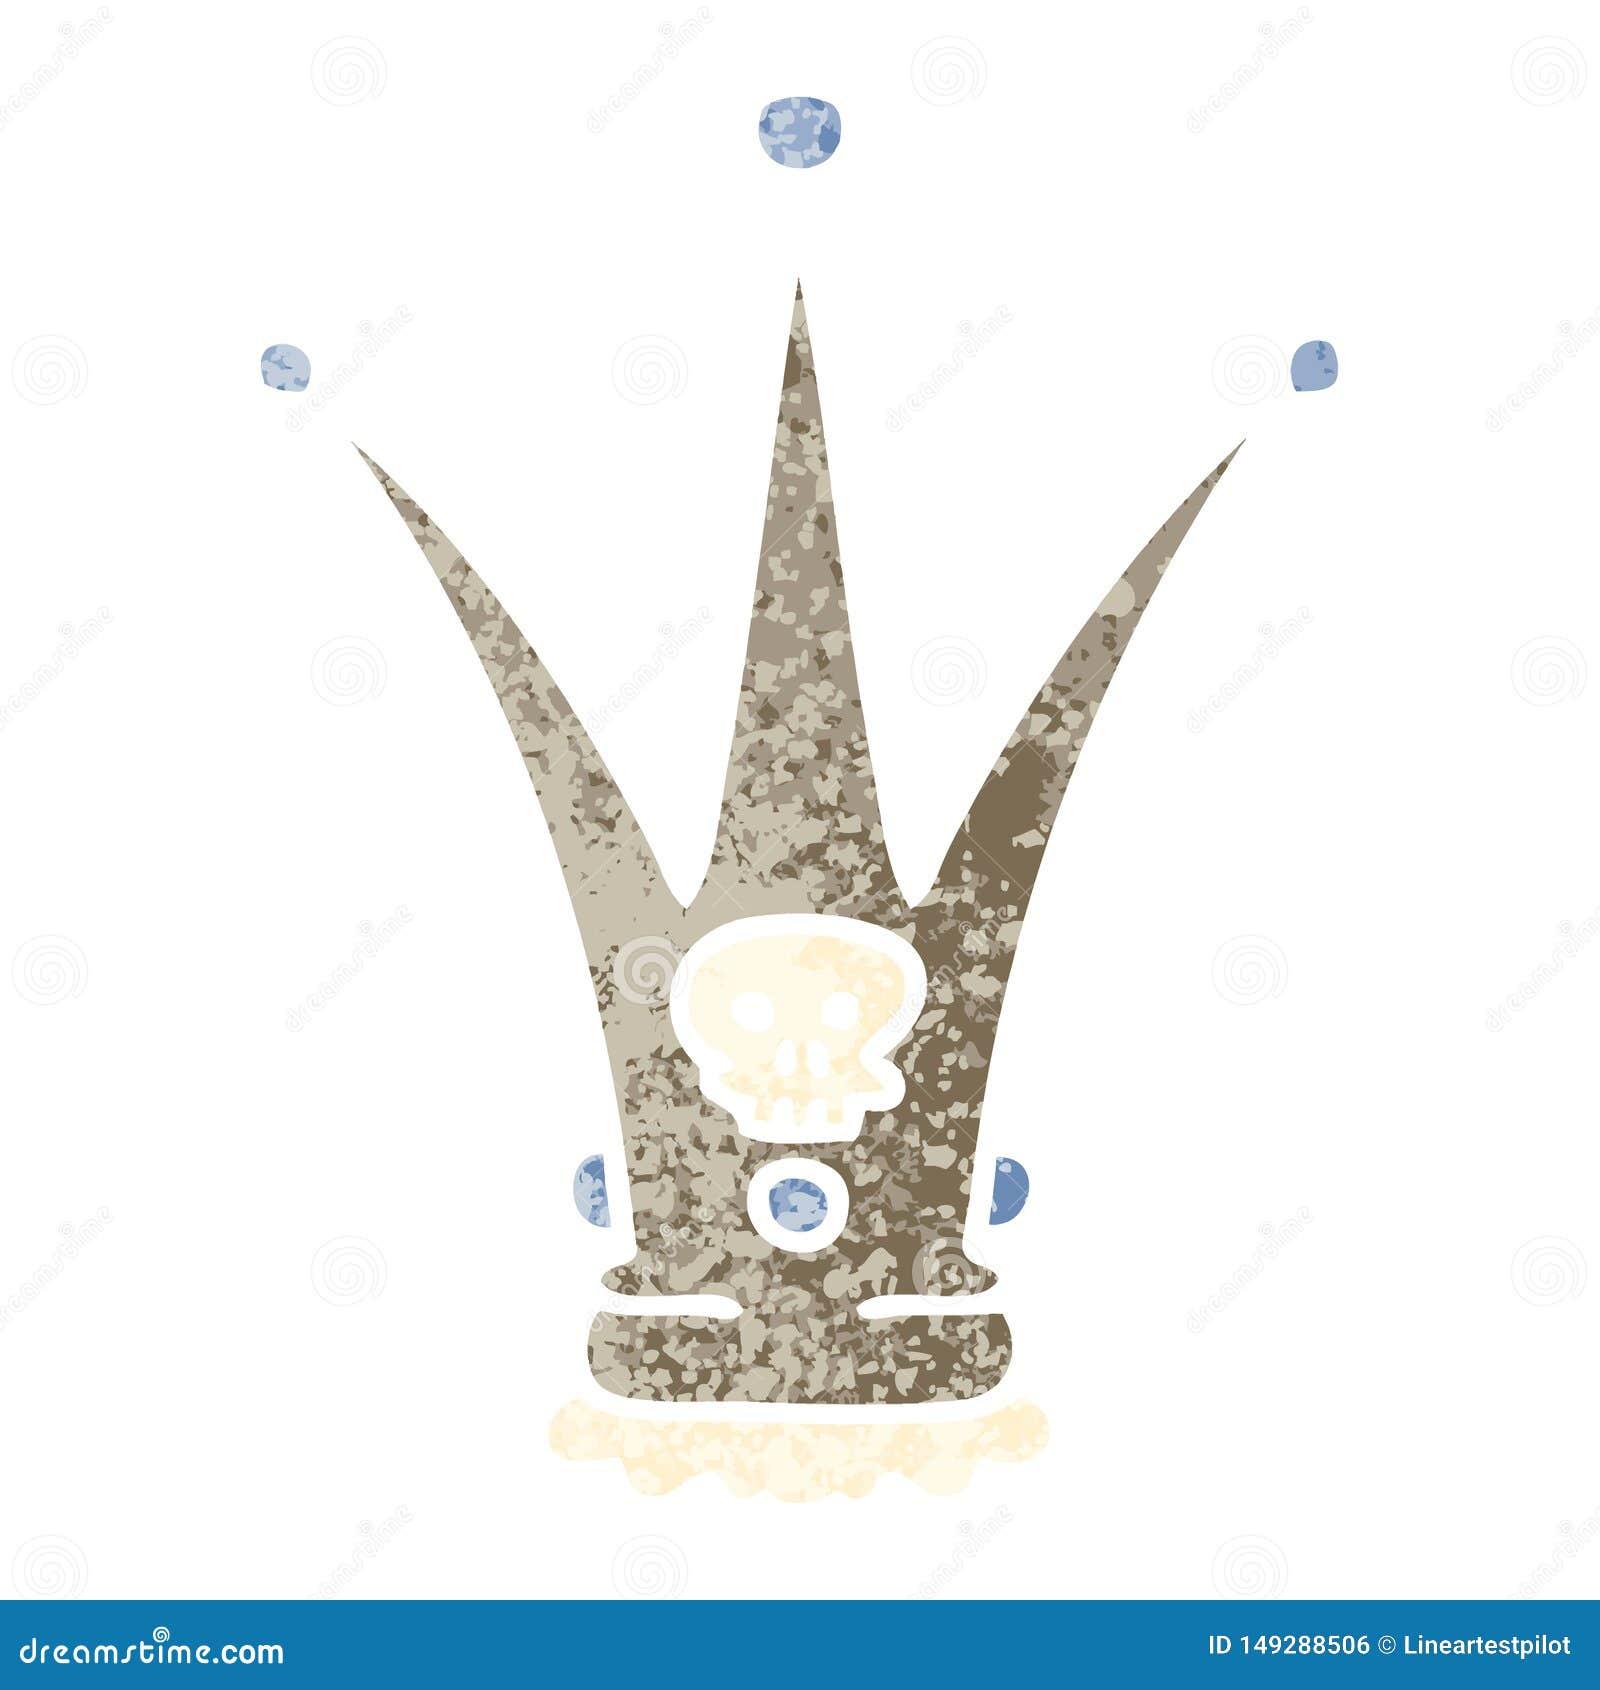 quirky retro illustration style cartoon death crown